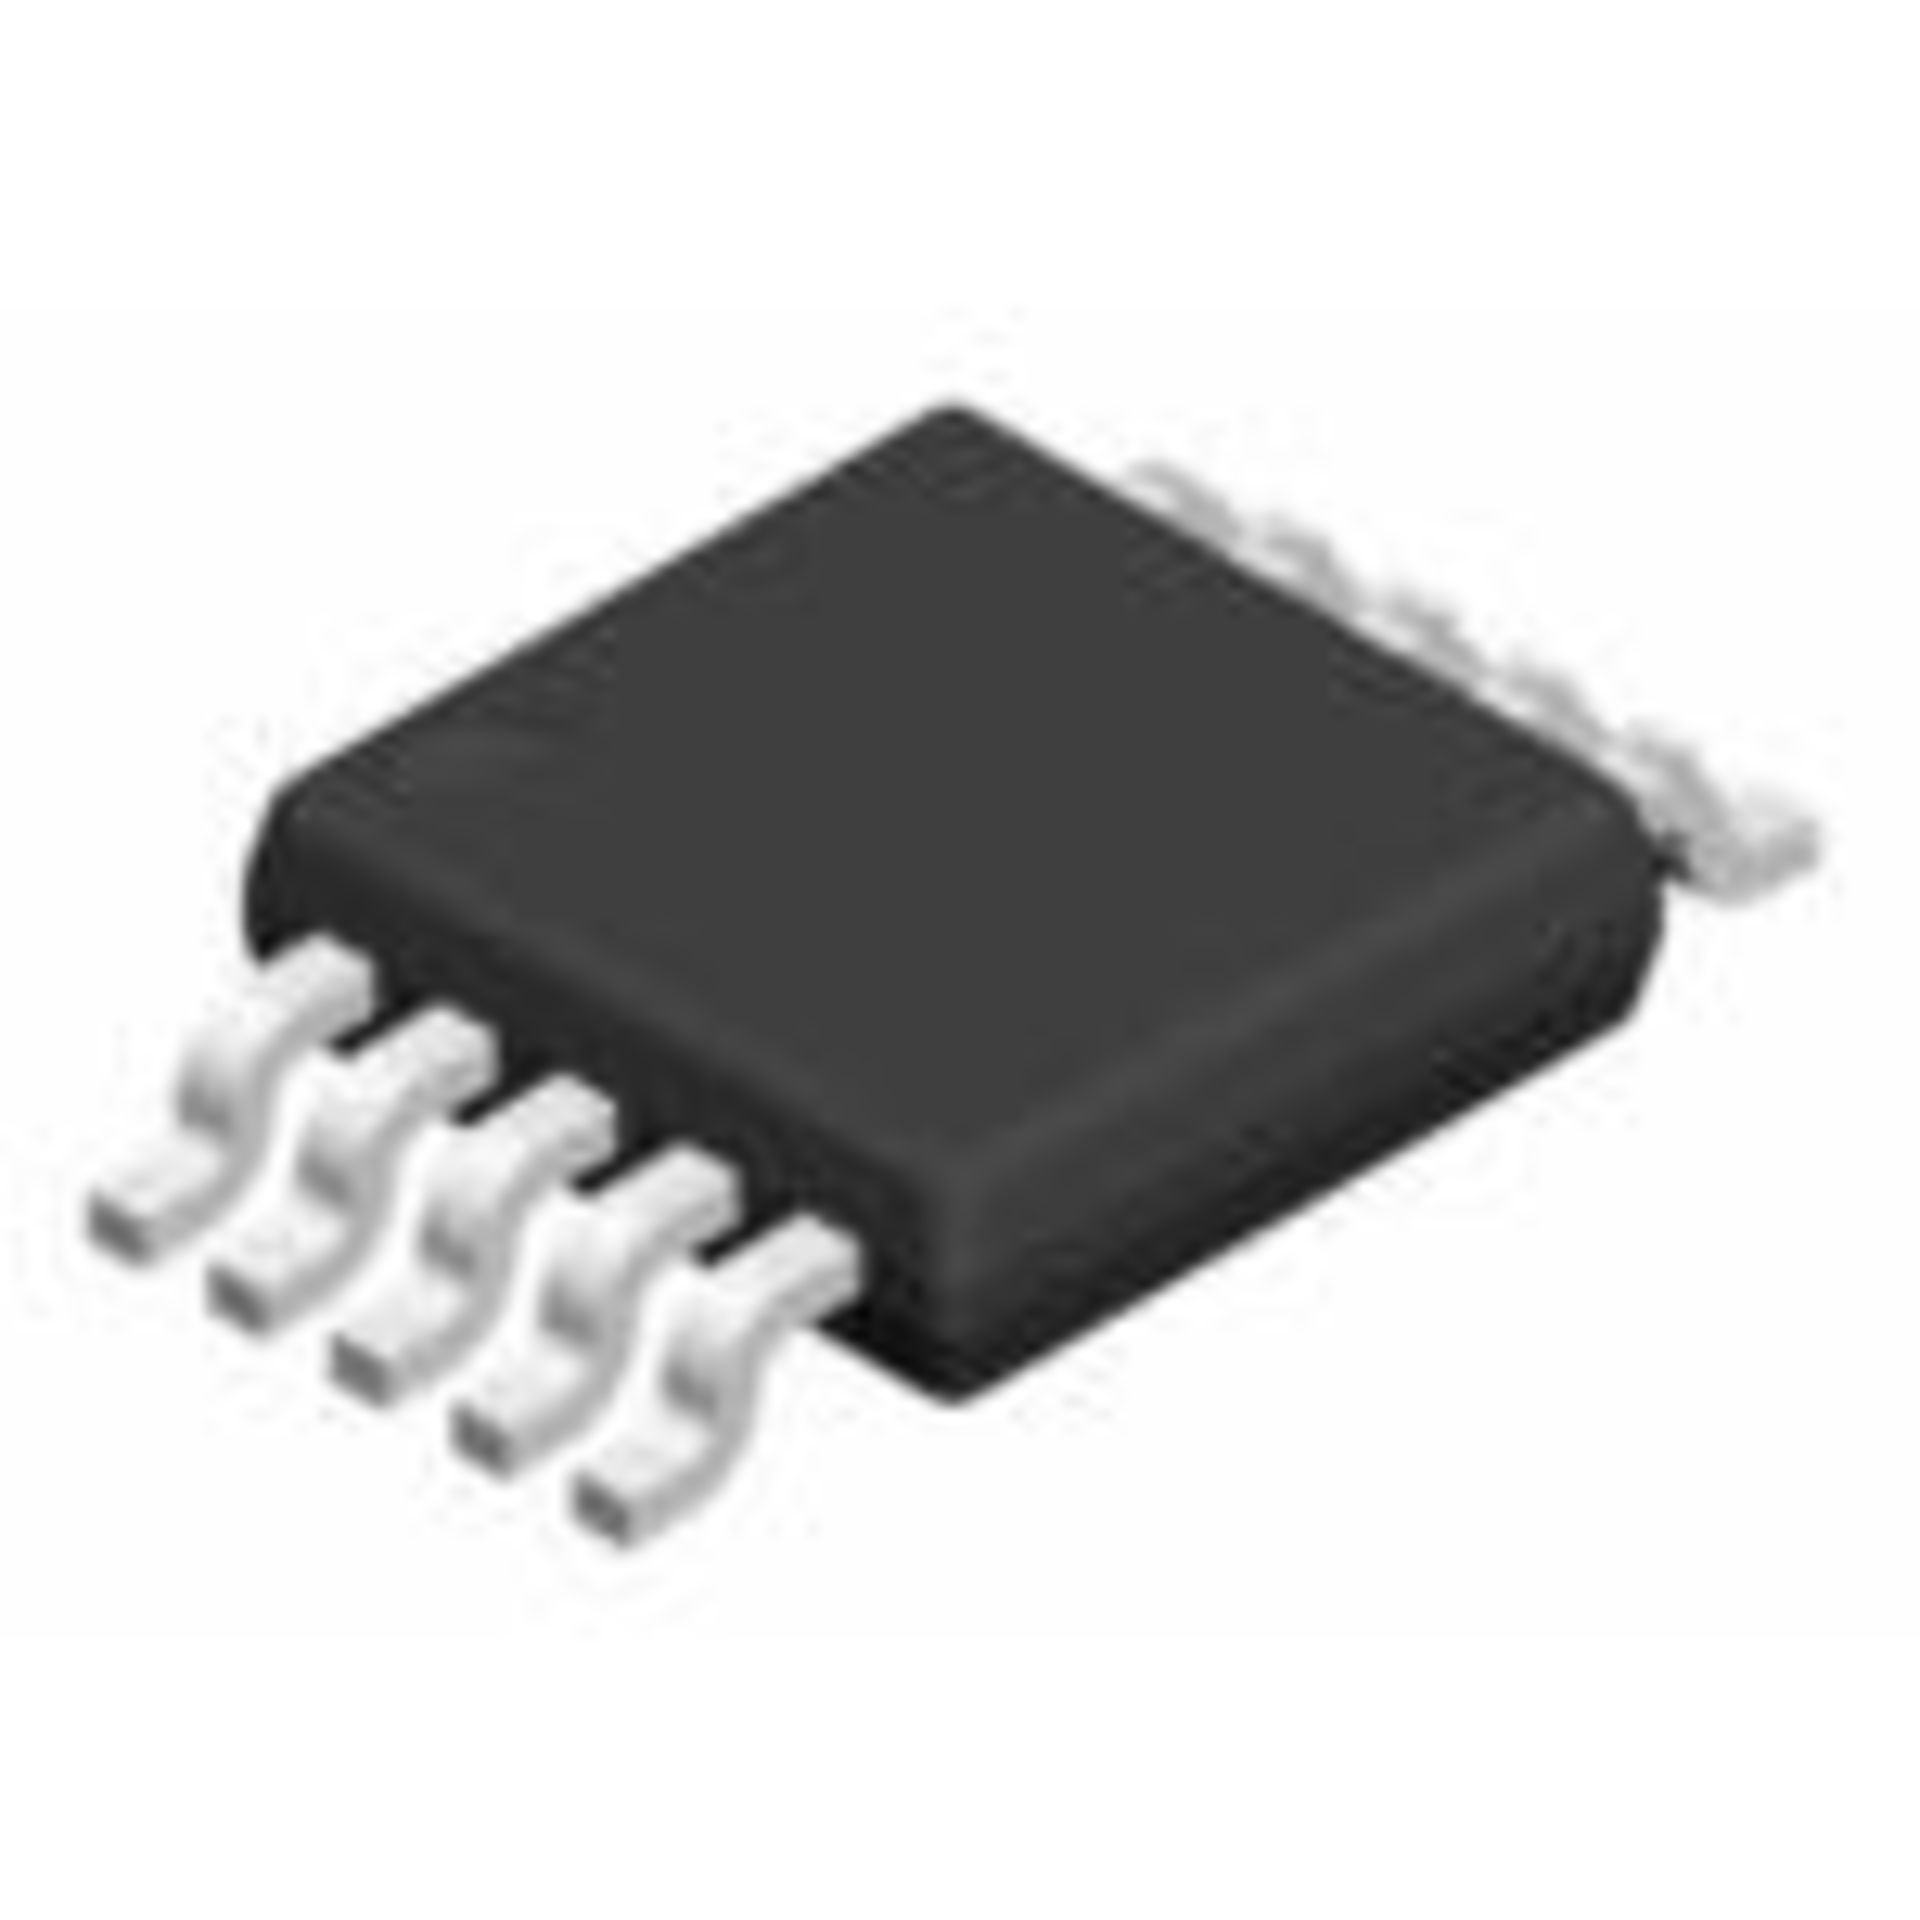 Texas Instruments TPS51100DGQ Special Purpose Voltage Regulators, DDR Termination Regulator 4.75V to